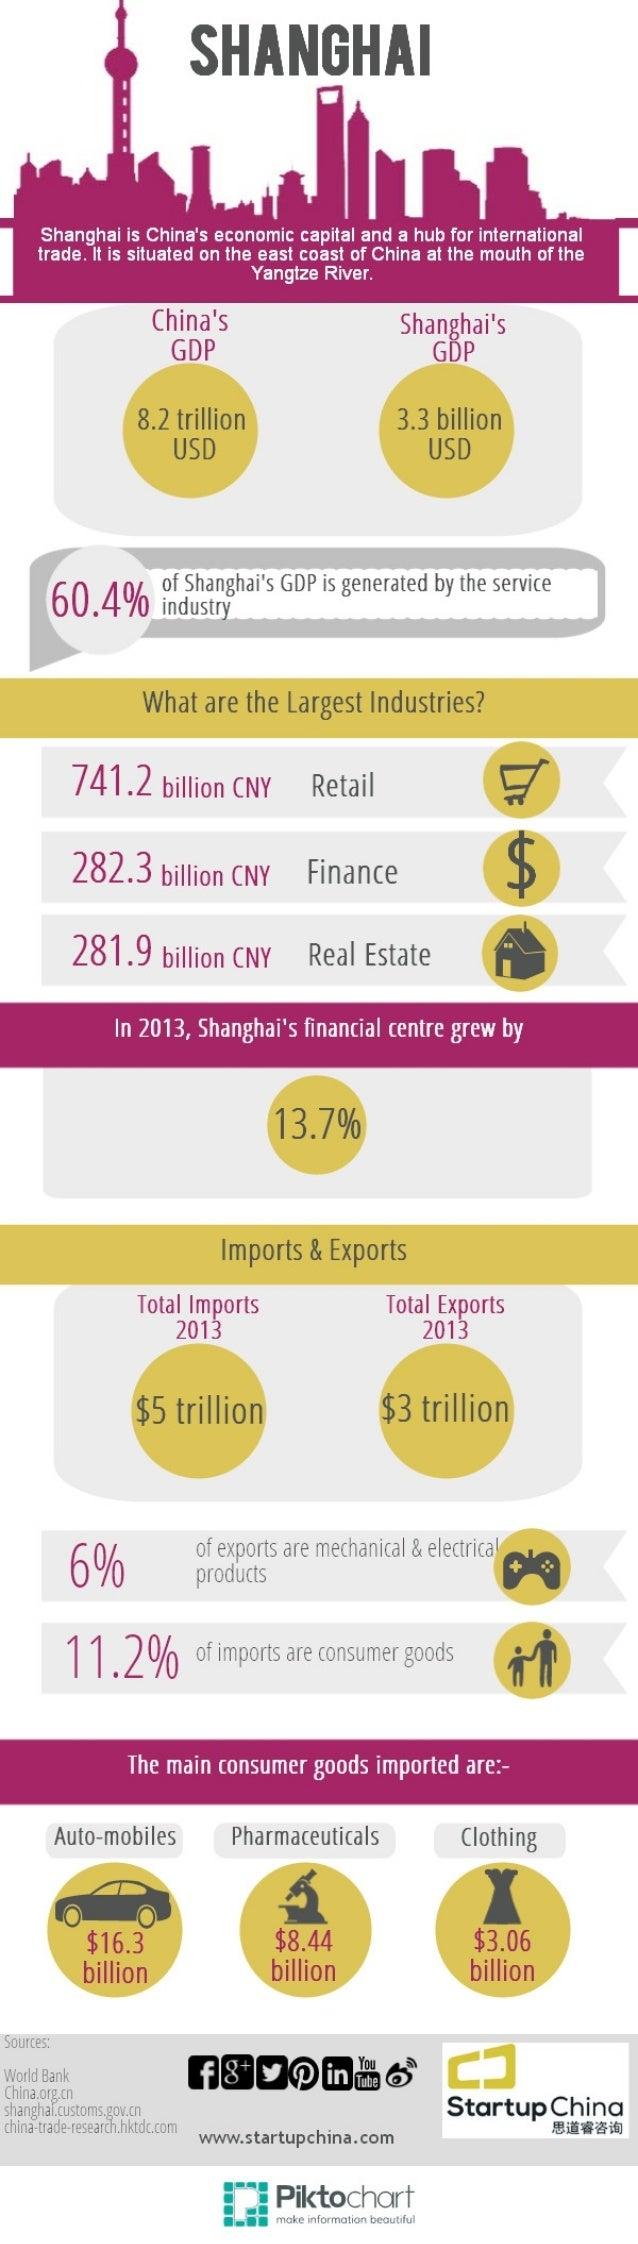 Shanghai Economy